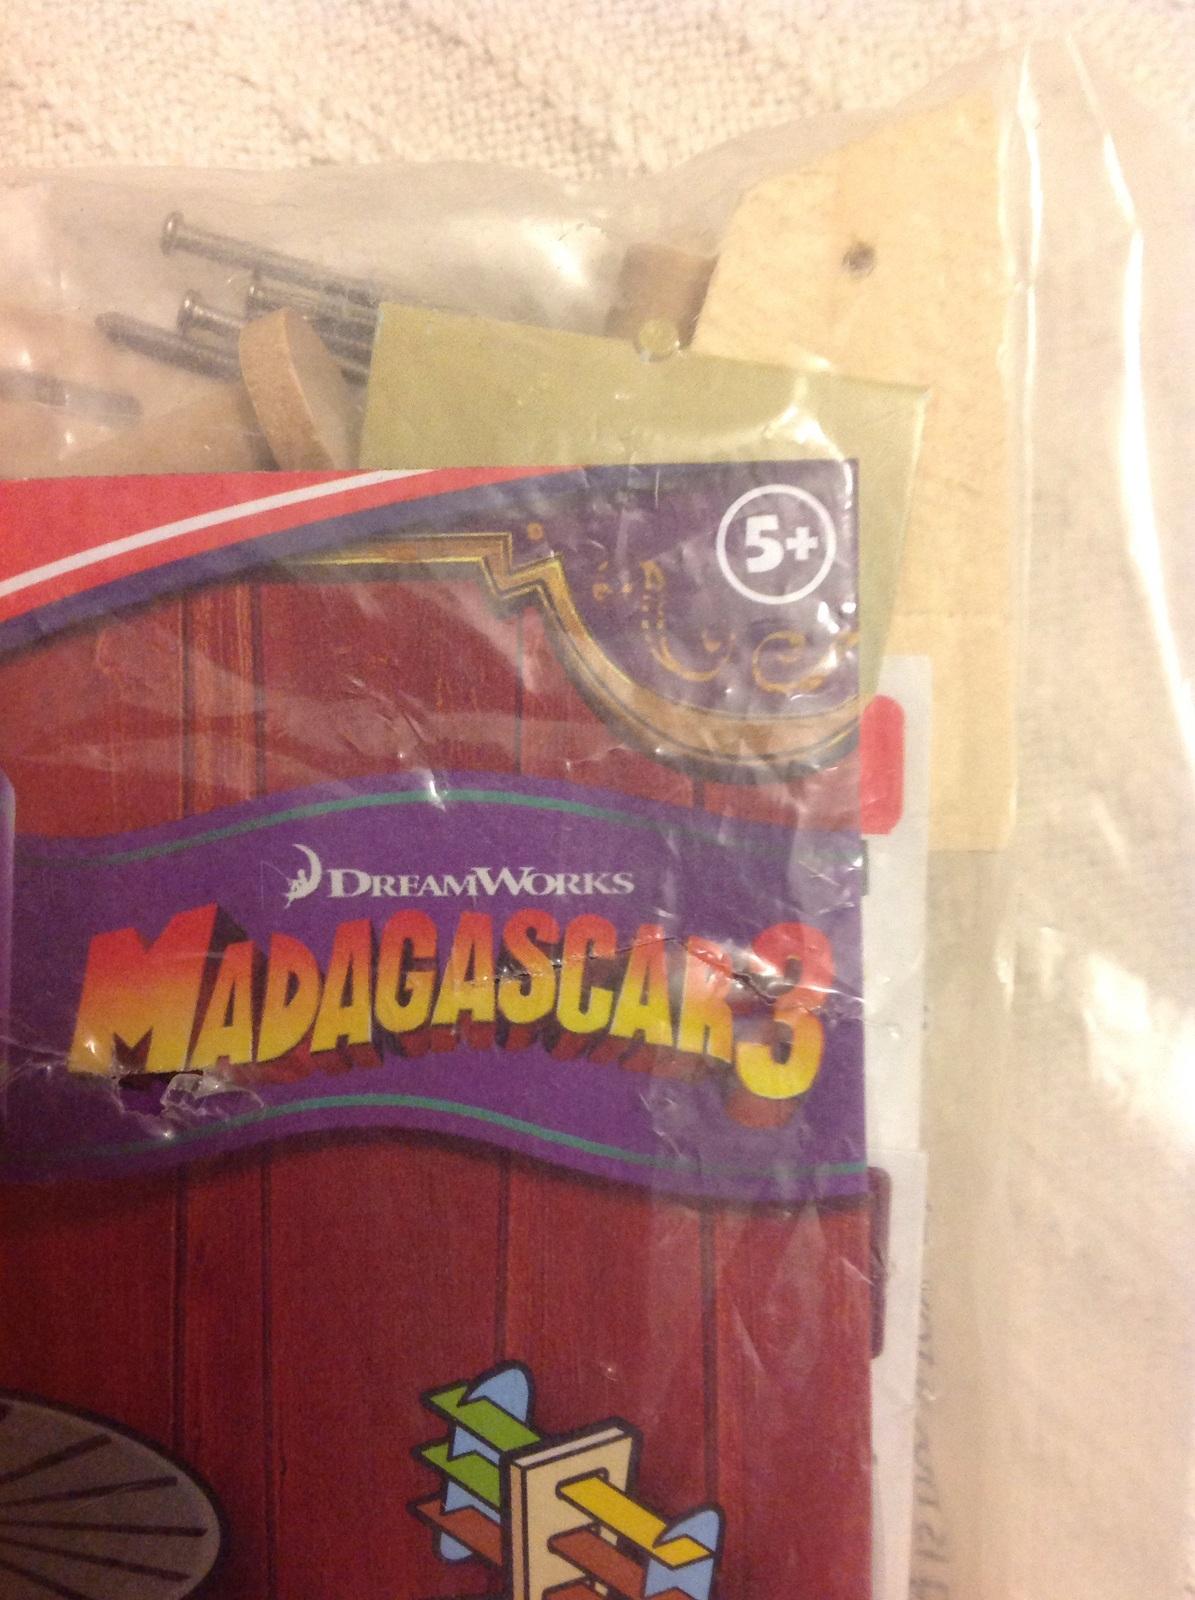 Lowes Build And Grow Madagascar 3 Monkey Powered Plane